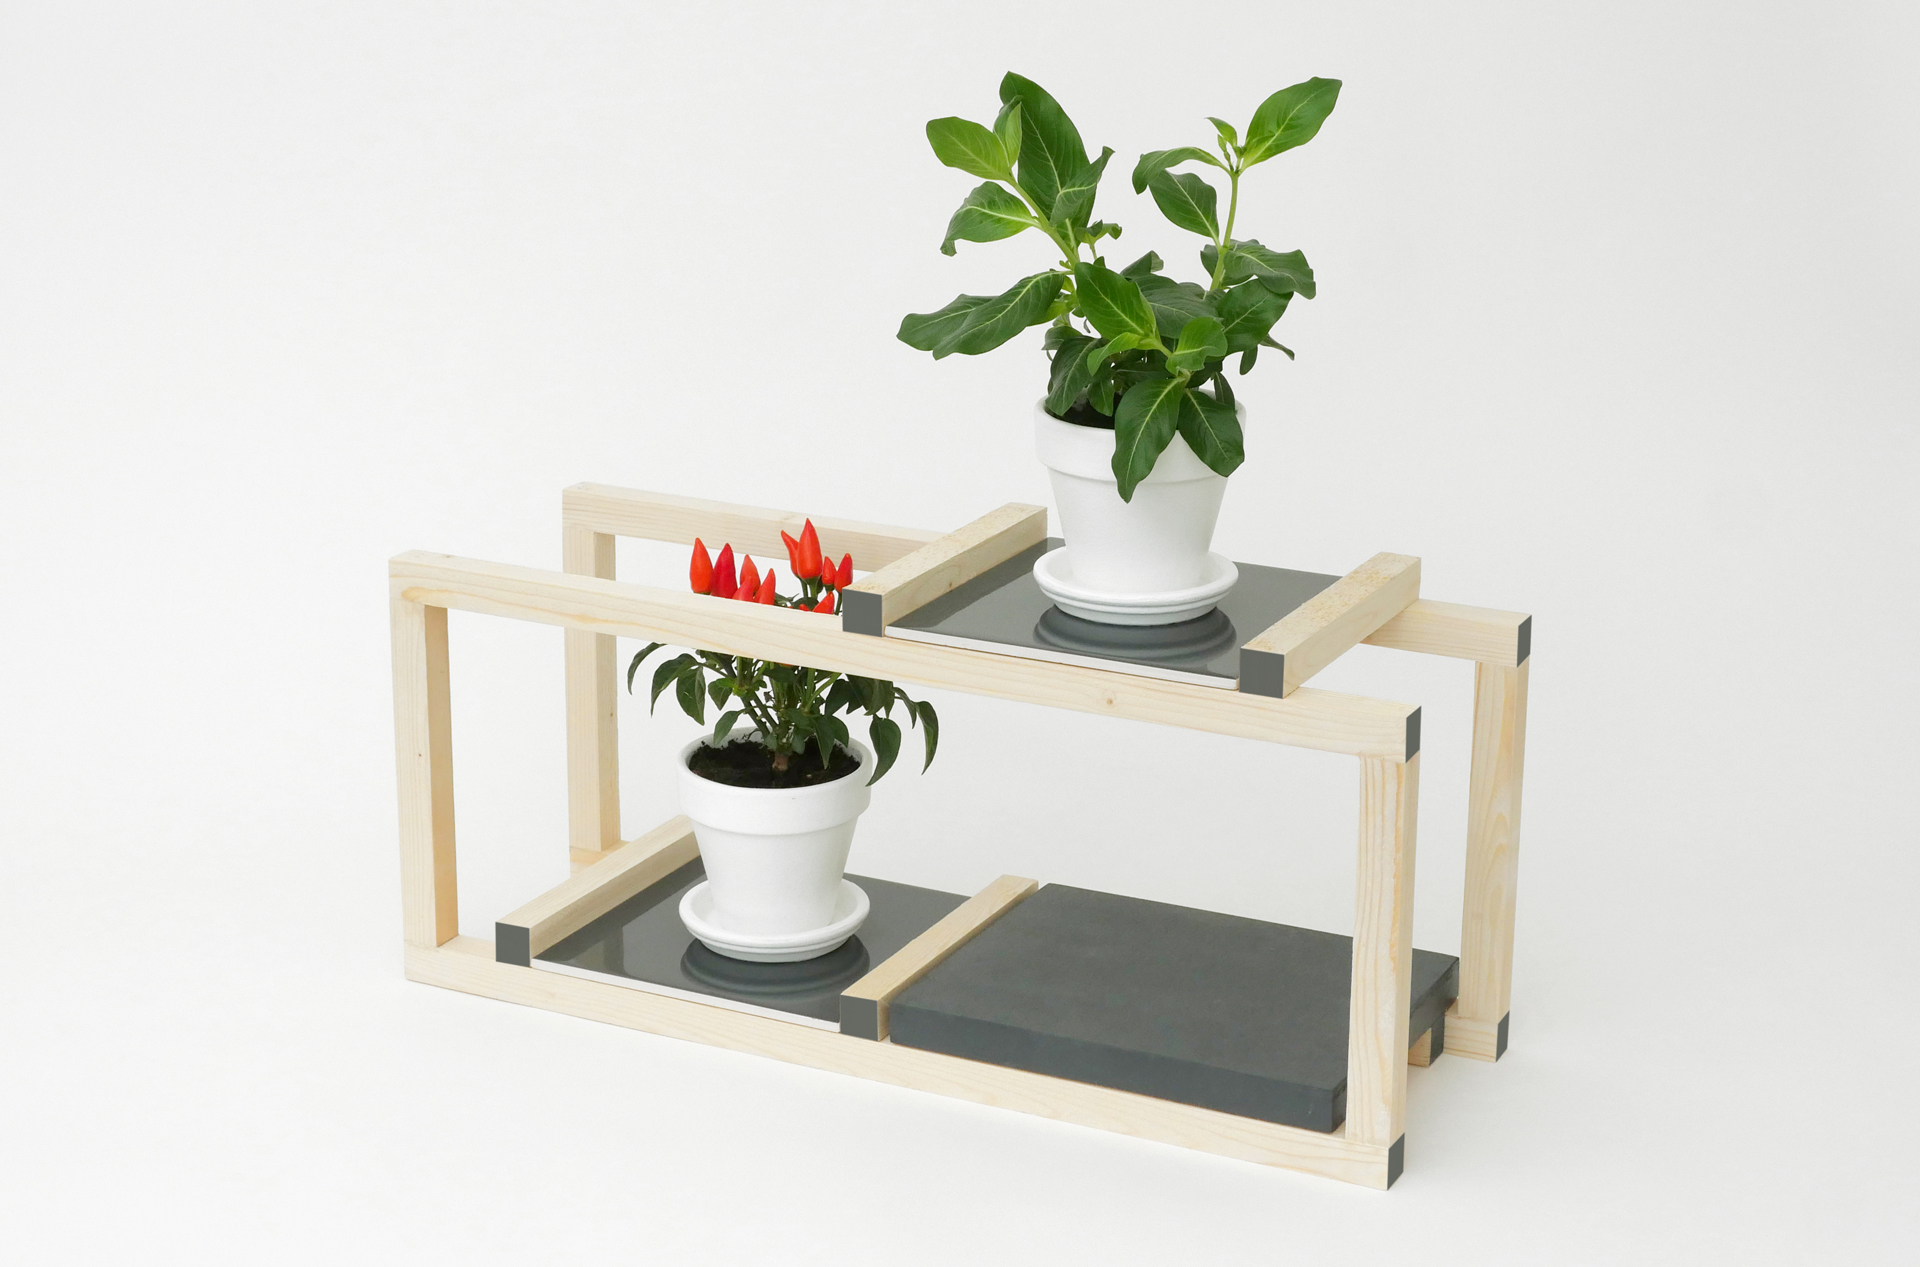 pierrelota_meuble_plantes_1_image14